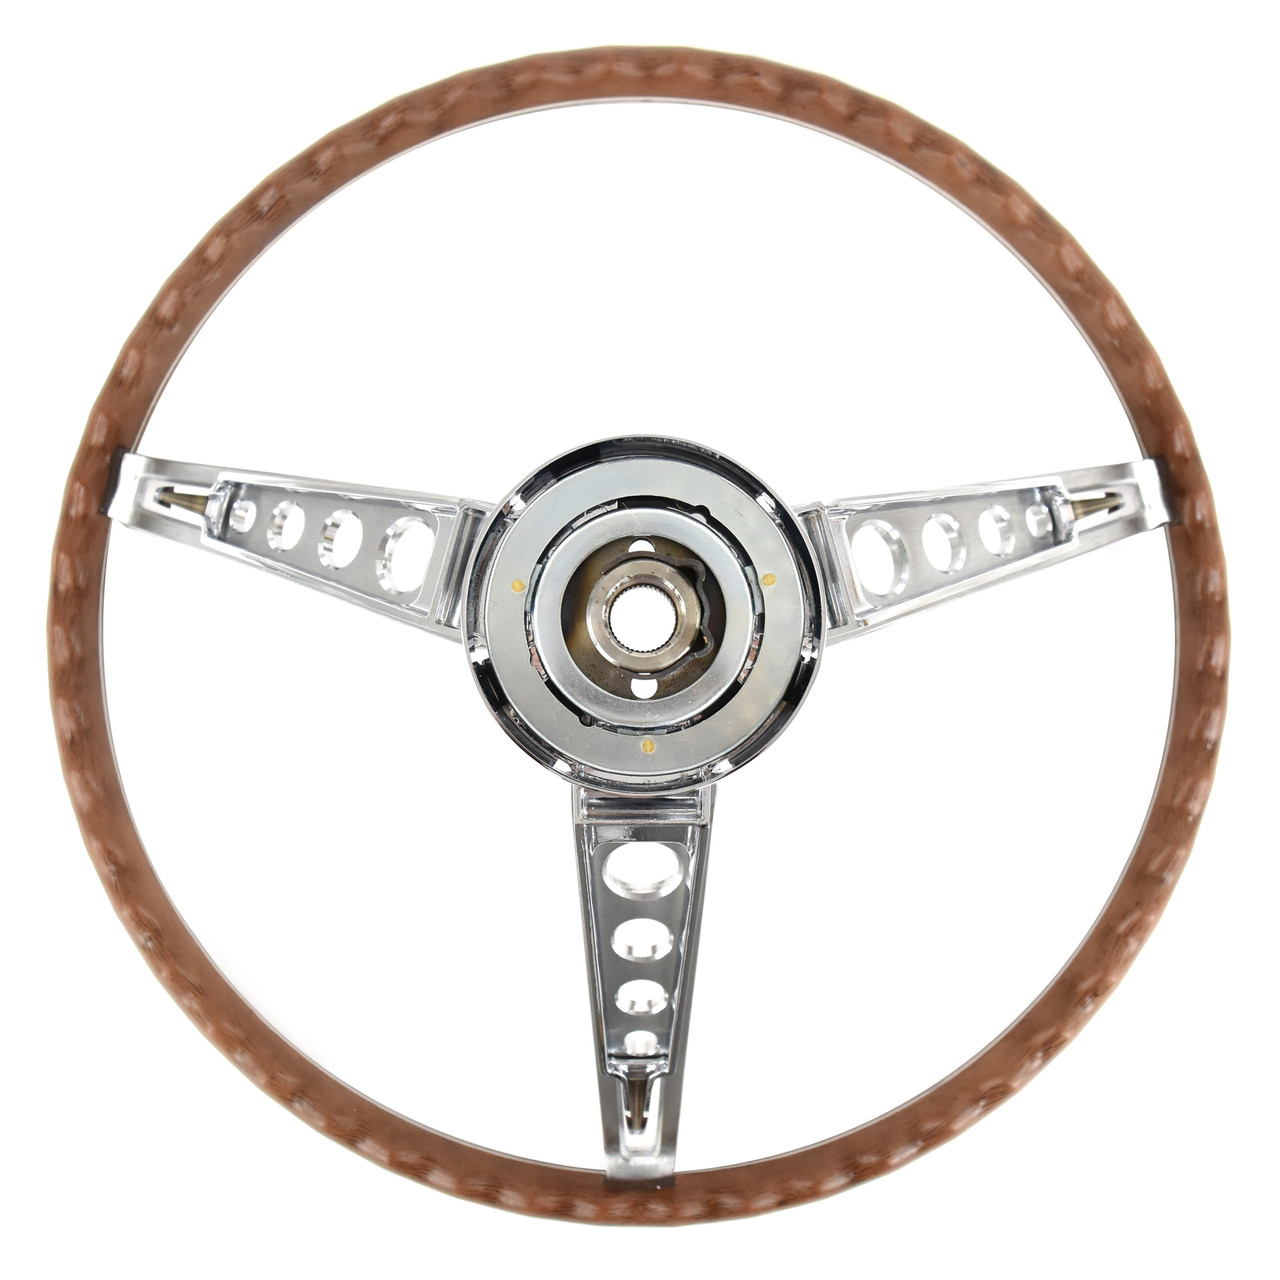 eClassics 1966 Ford Fairlane Steering Wheel Assembly Deluxe Woodgrain